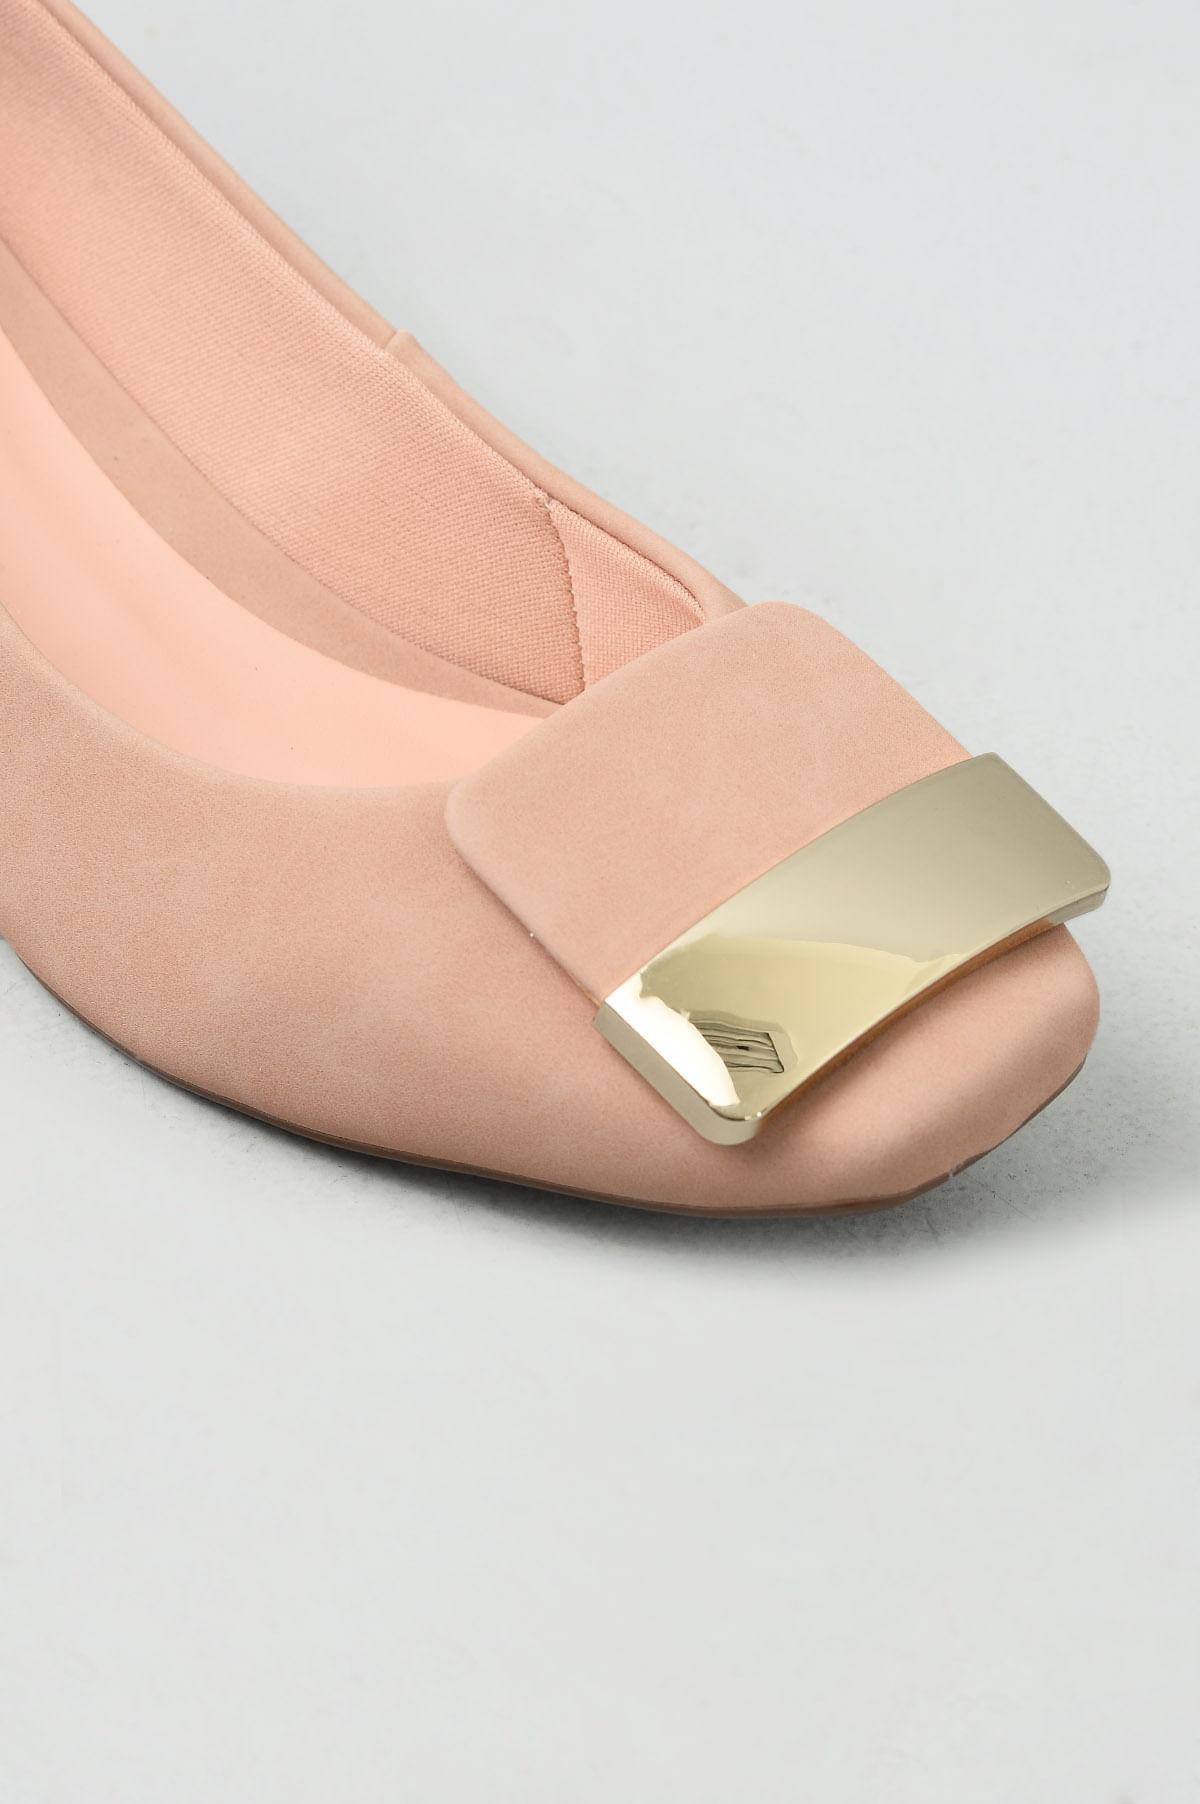 ef8e91373 Sapato Feminino Salto Baixo Bethy Mundial NB - NUDE - Mundial Calçados